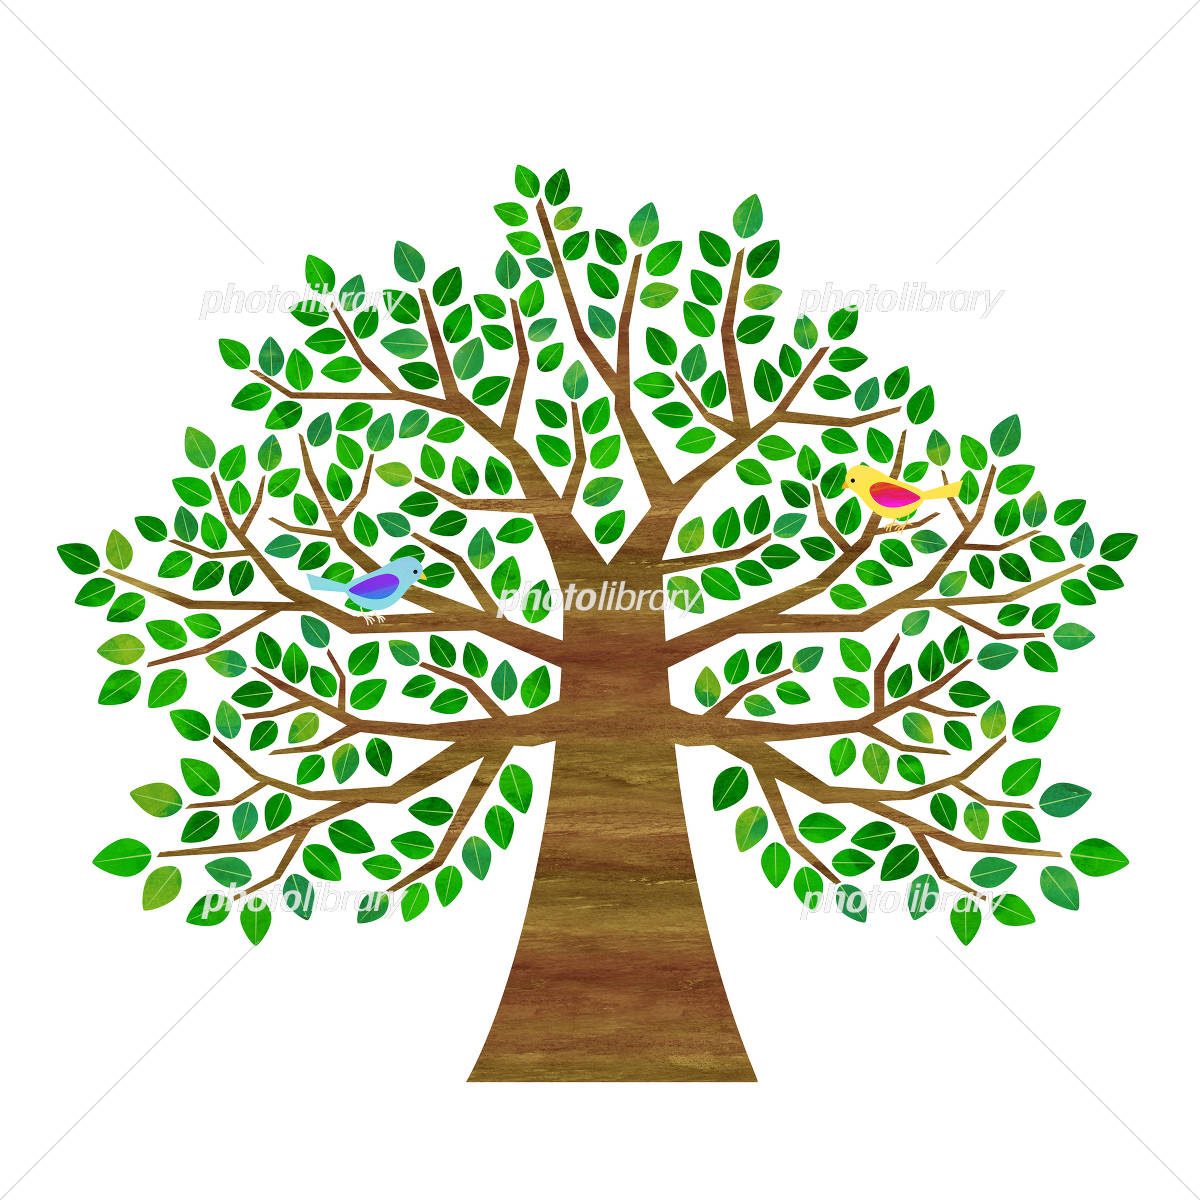 Big trees and birds イラスト素材